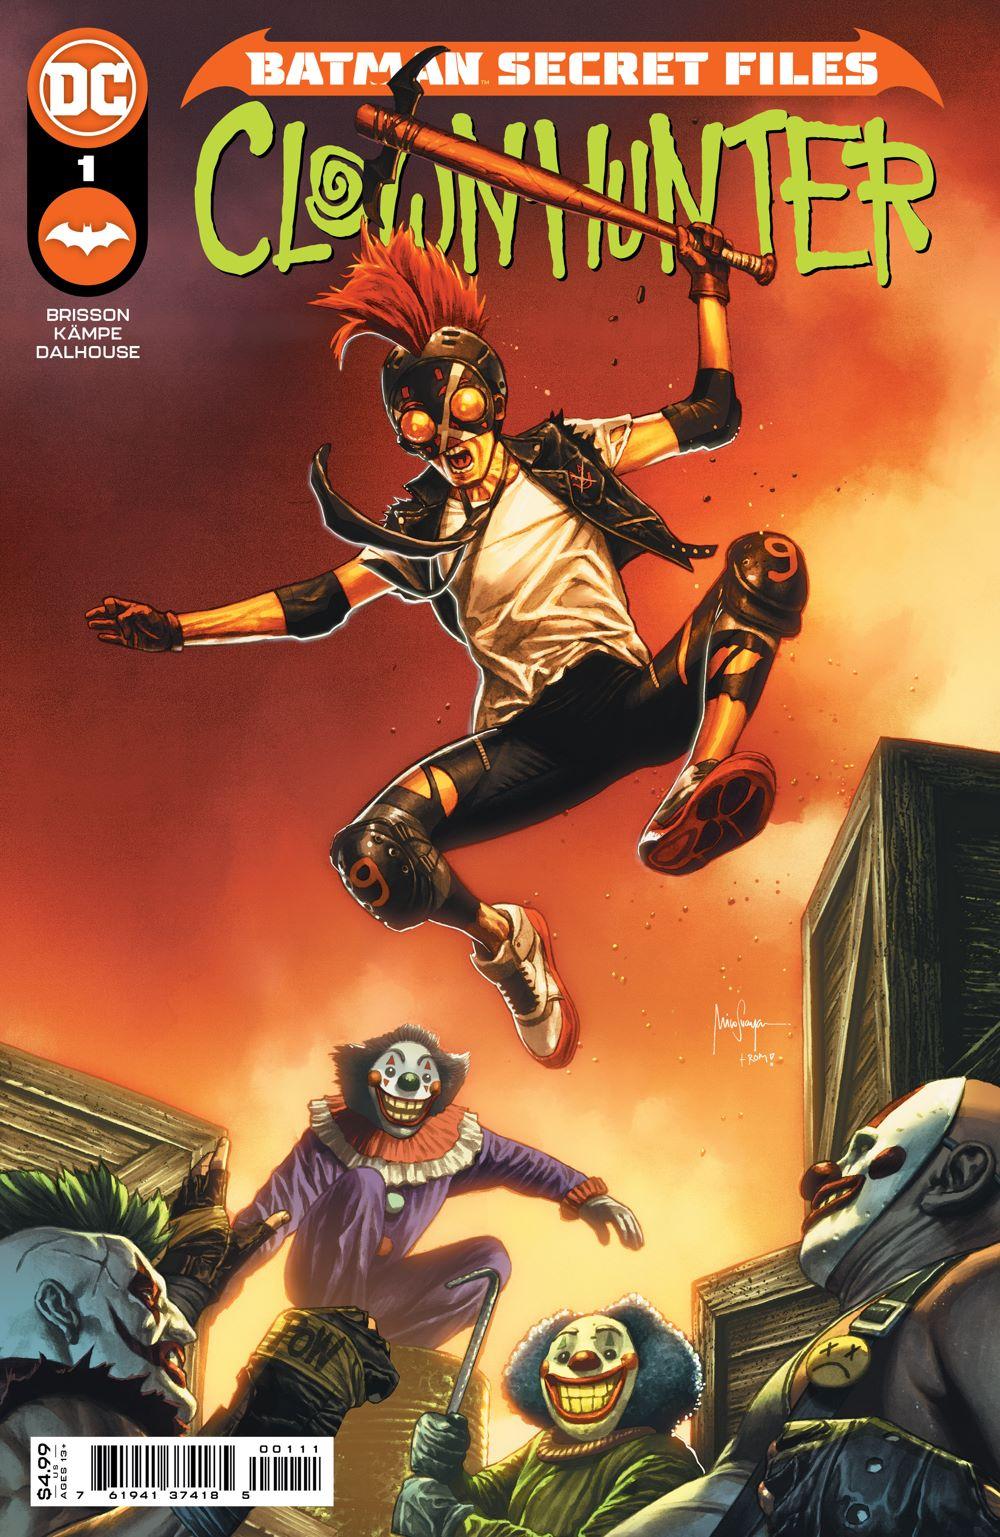 BMSF_CLWNHNTR_Cv1 DC Comics August 2021 Solicitations